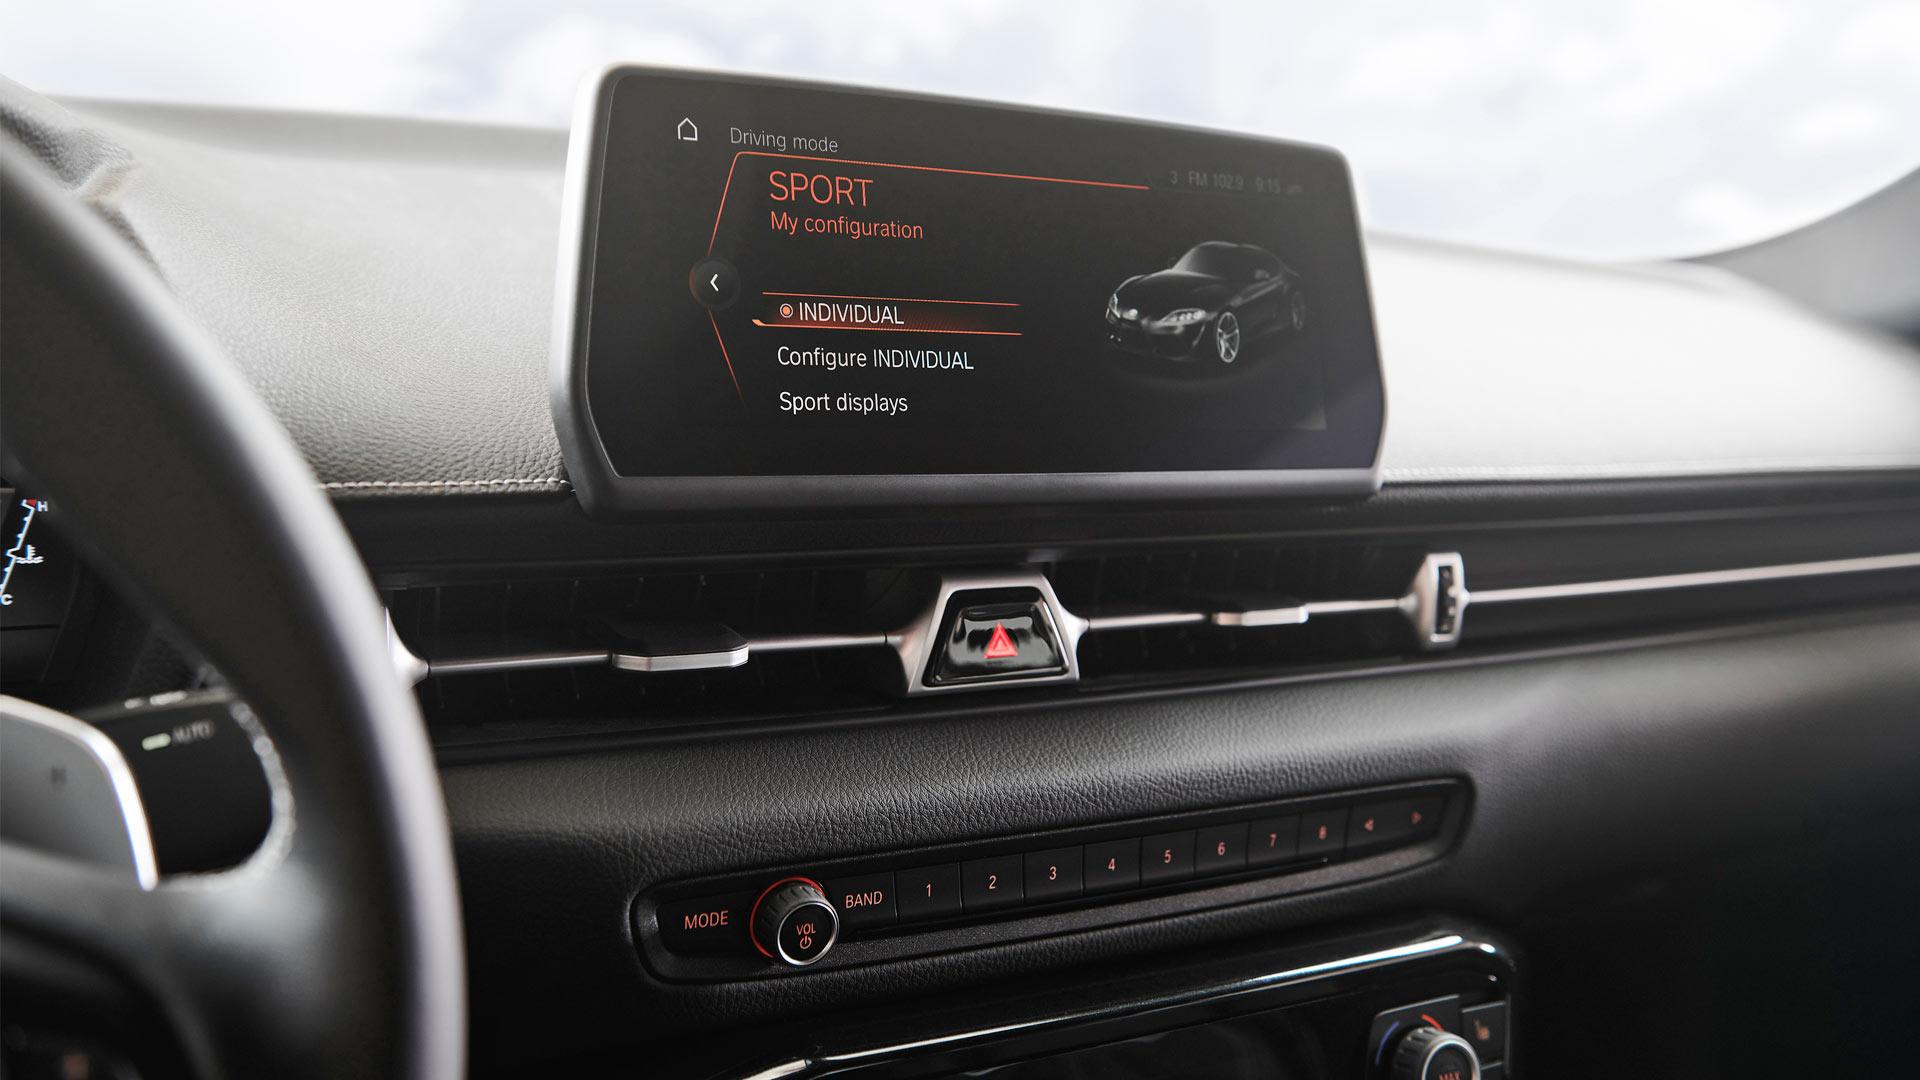 2020 Toyota Supra Interior BMW iDrive